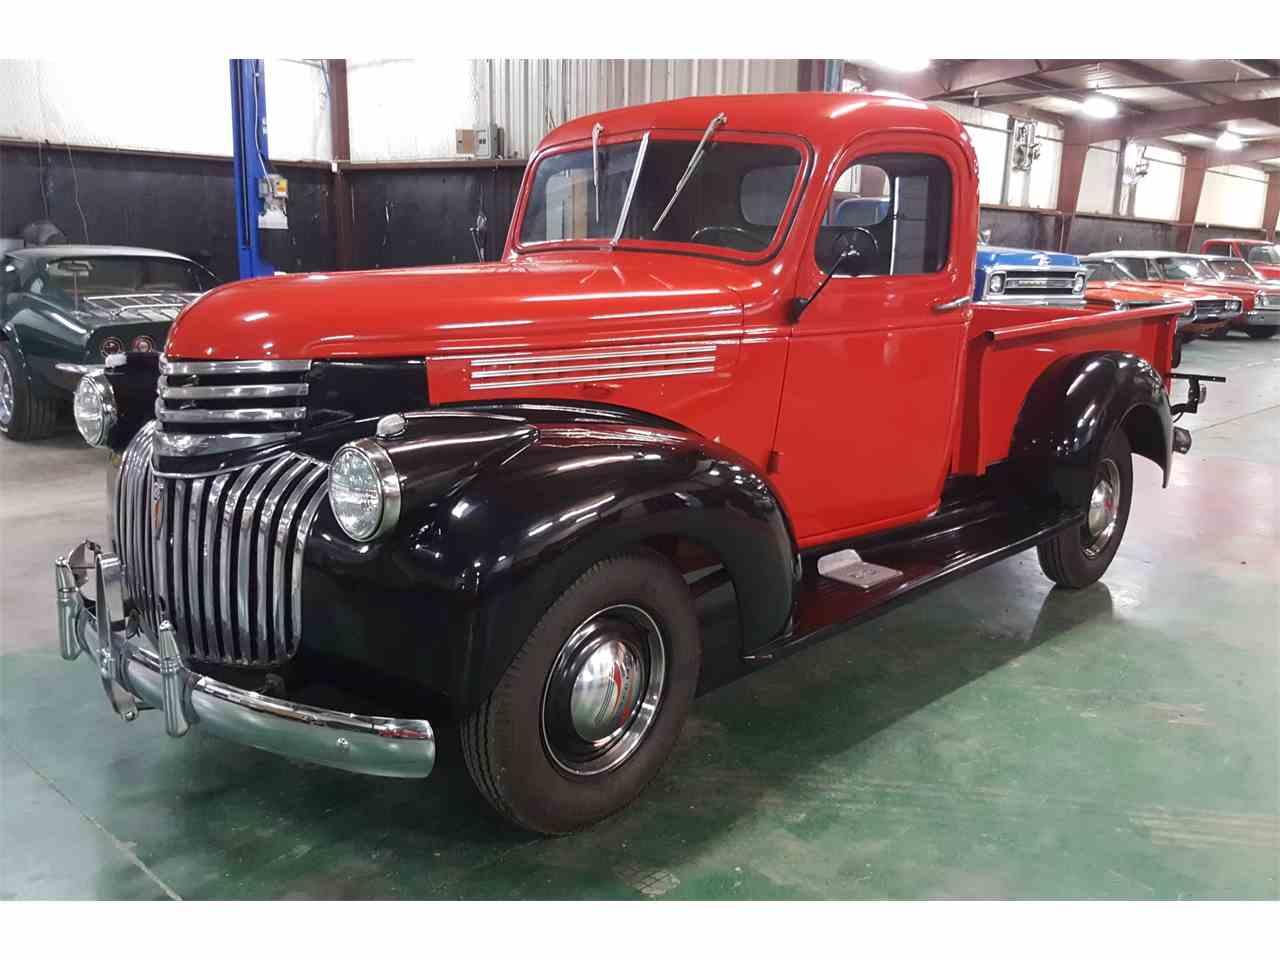 1946 Chevrolet Pickup for Sale | ClassicCars.com | CC-1028549